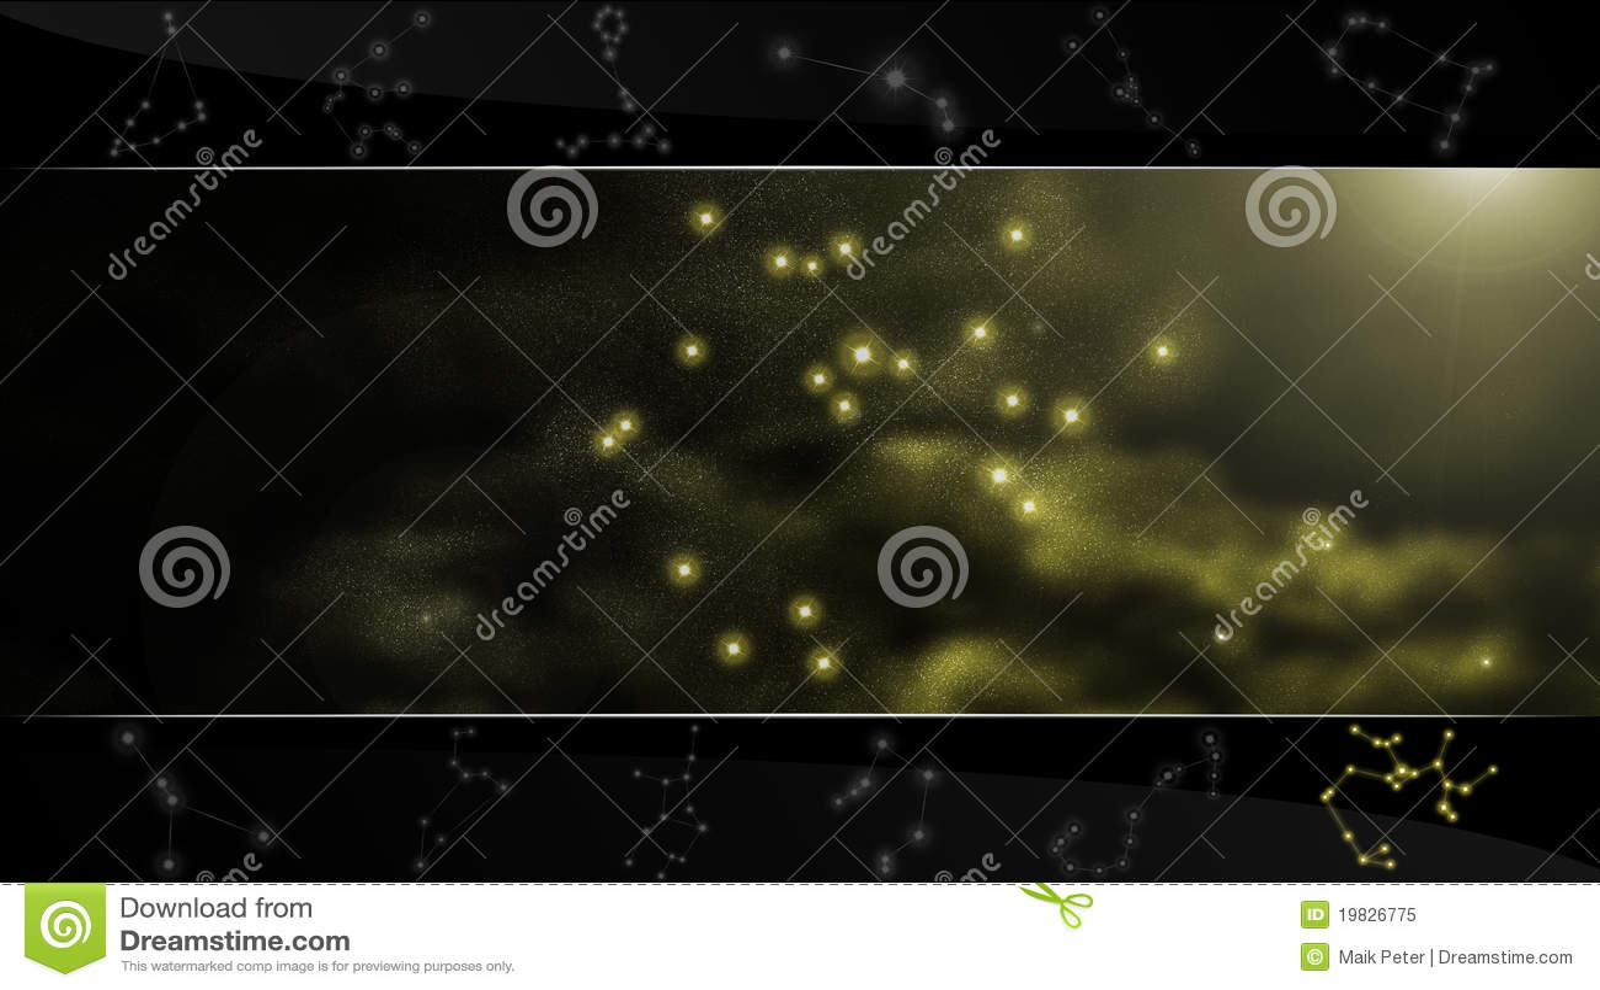 The archer star sign Sagittarius